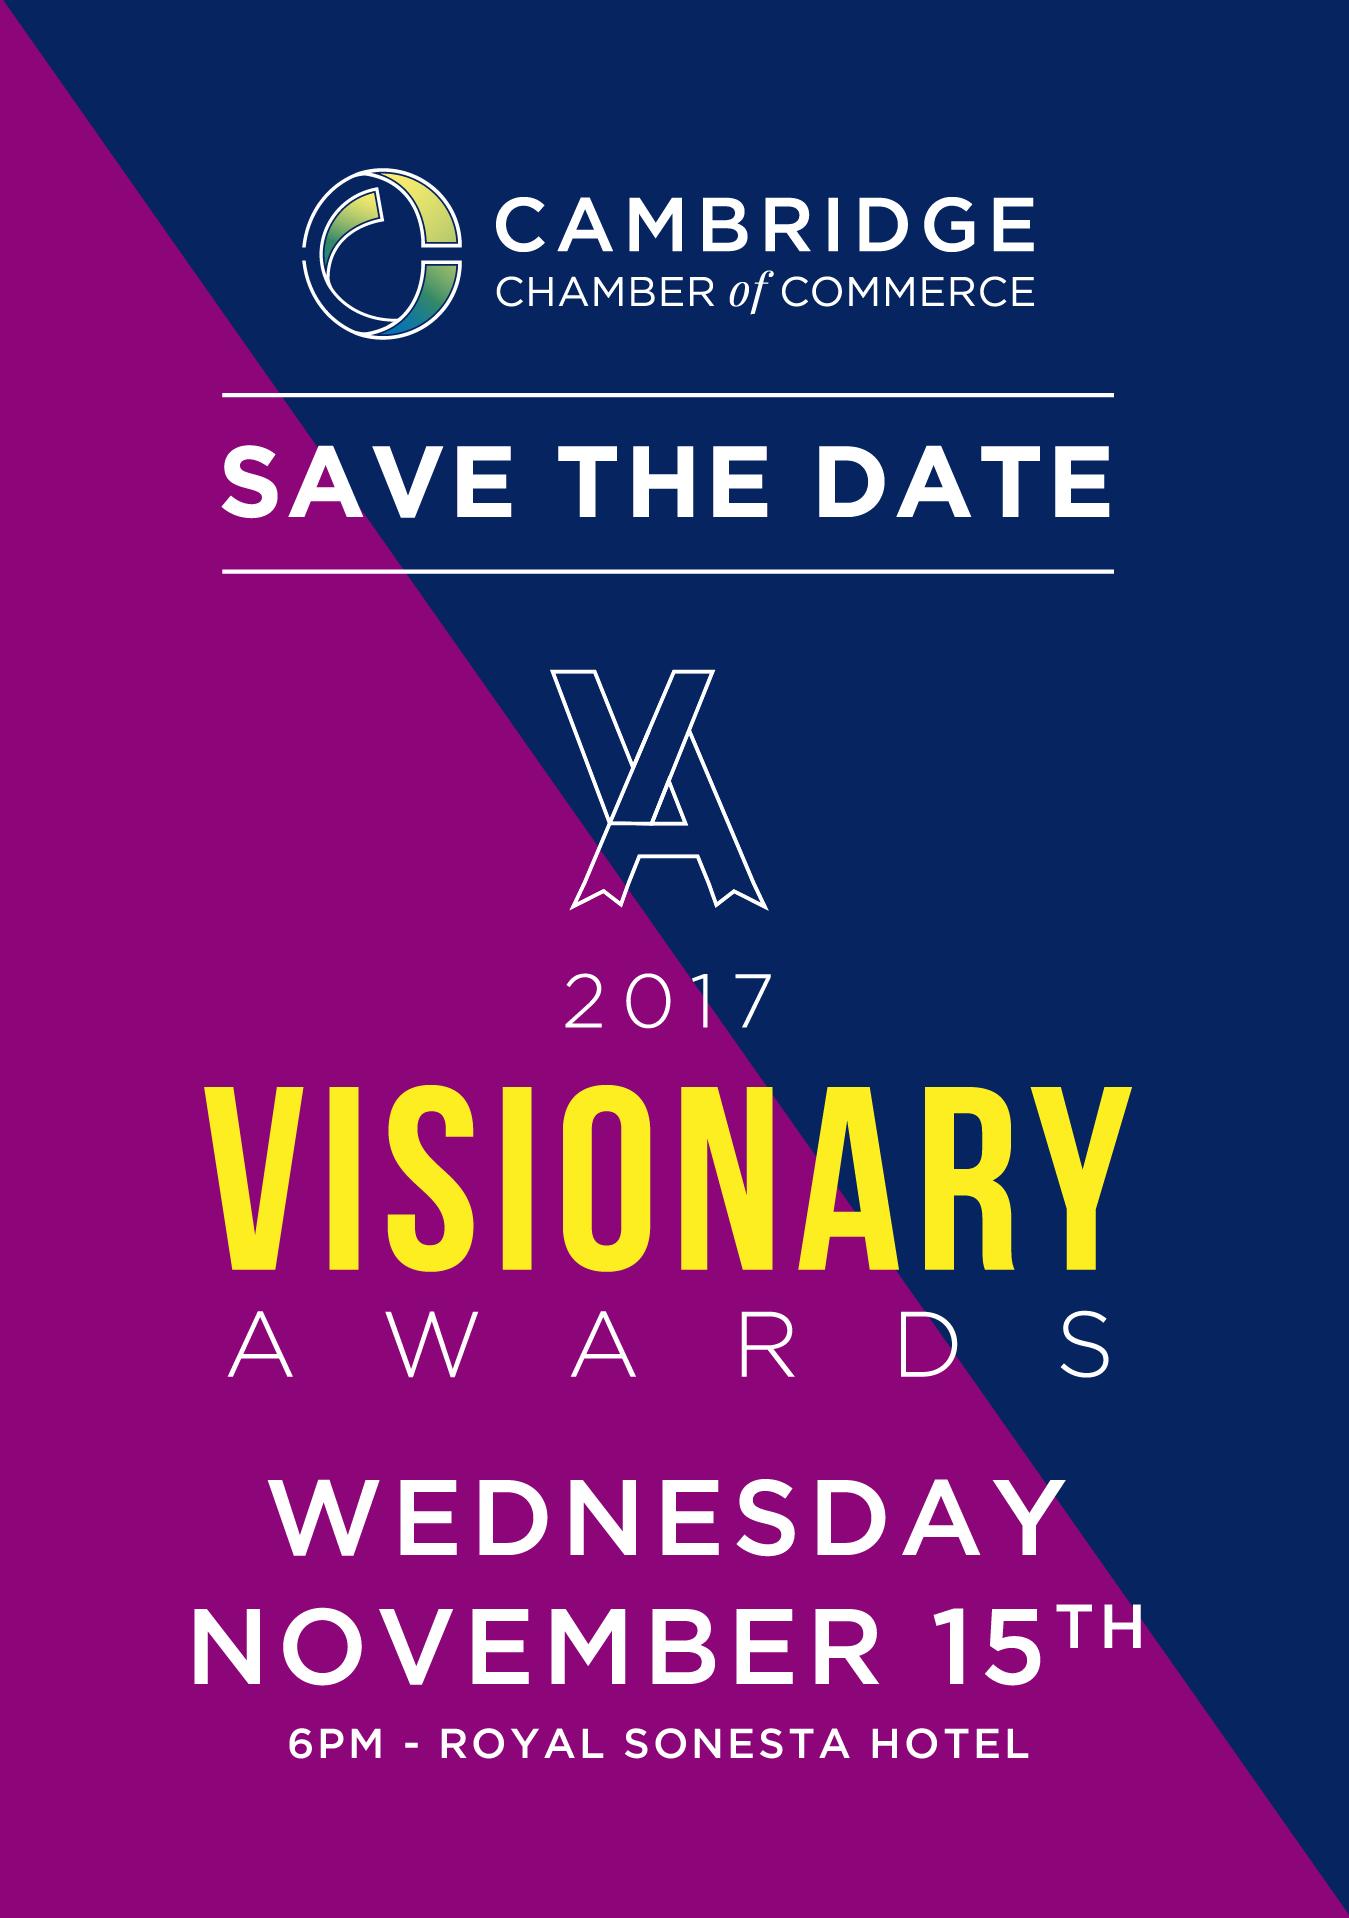 Visionary Awards Nomination Form